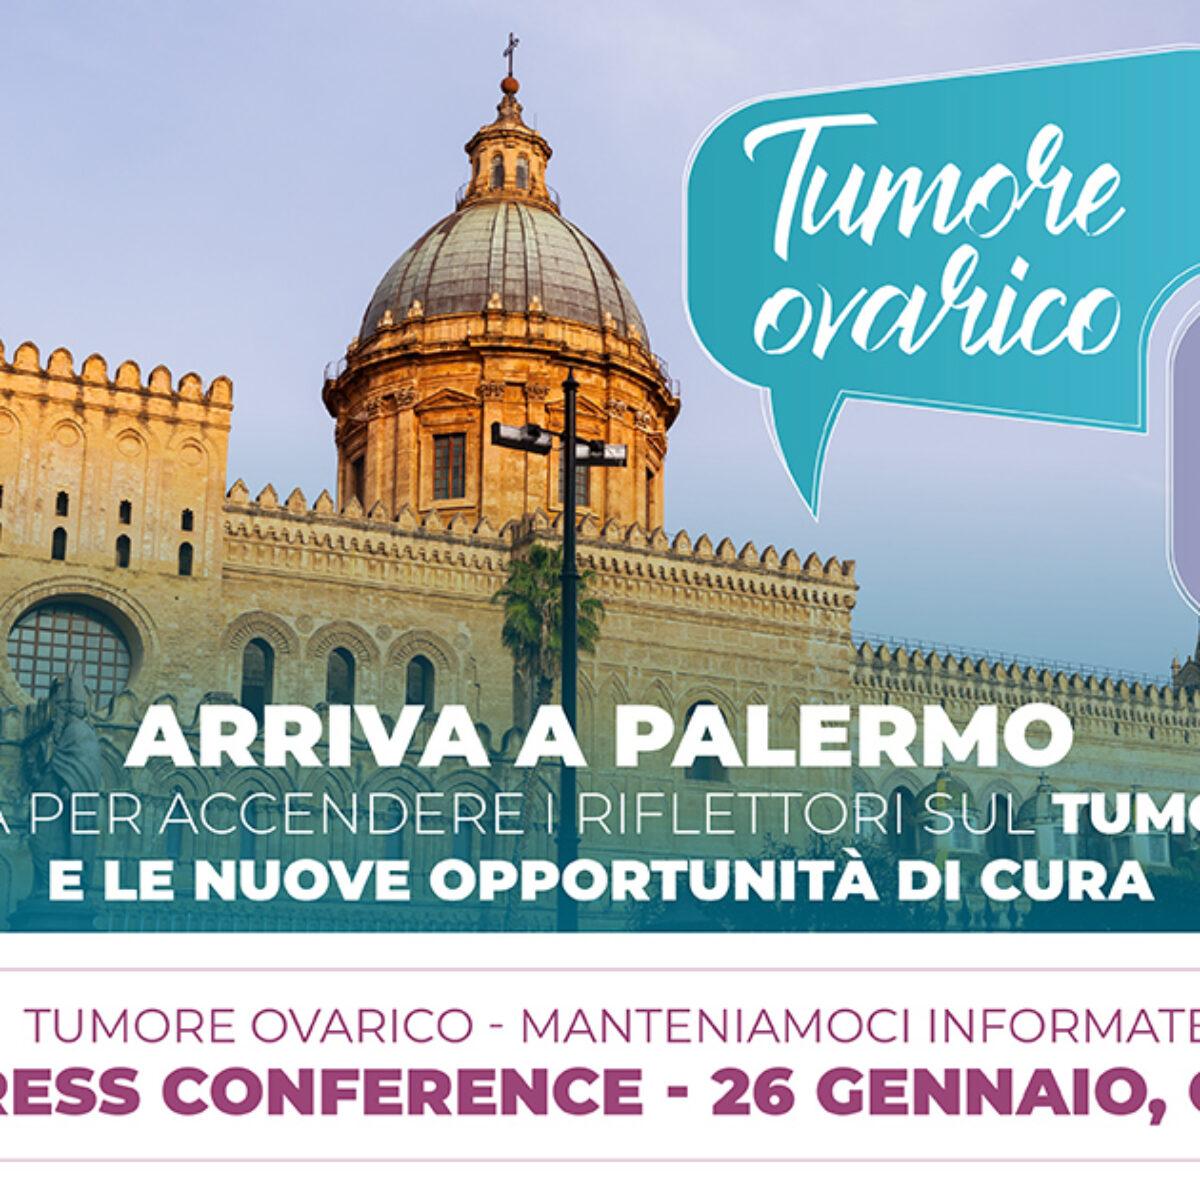 imm_Facebook_Palermo